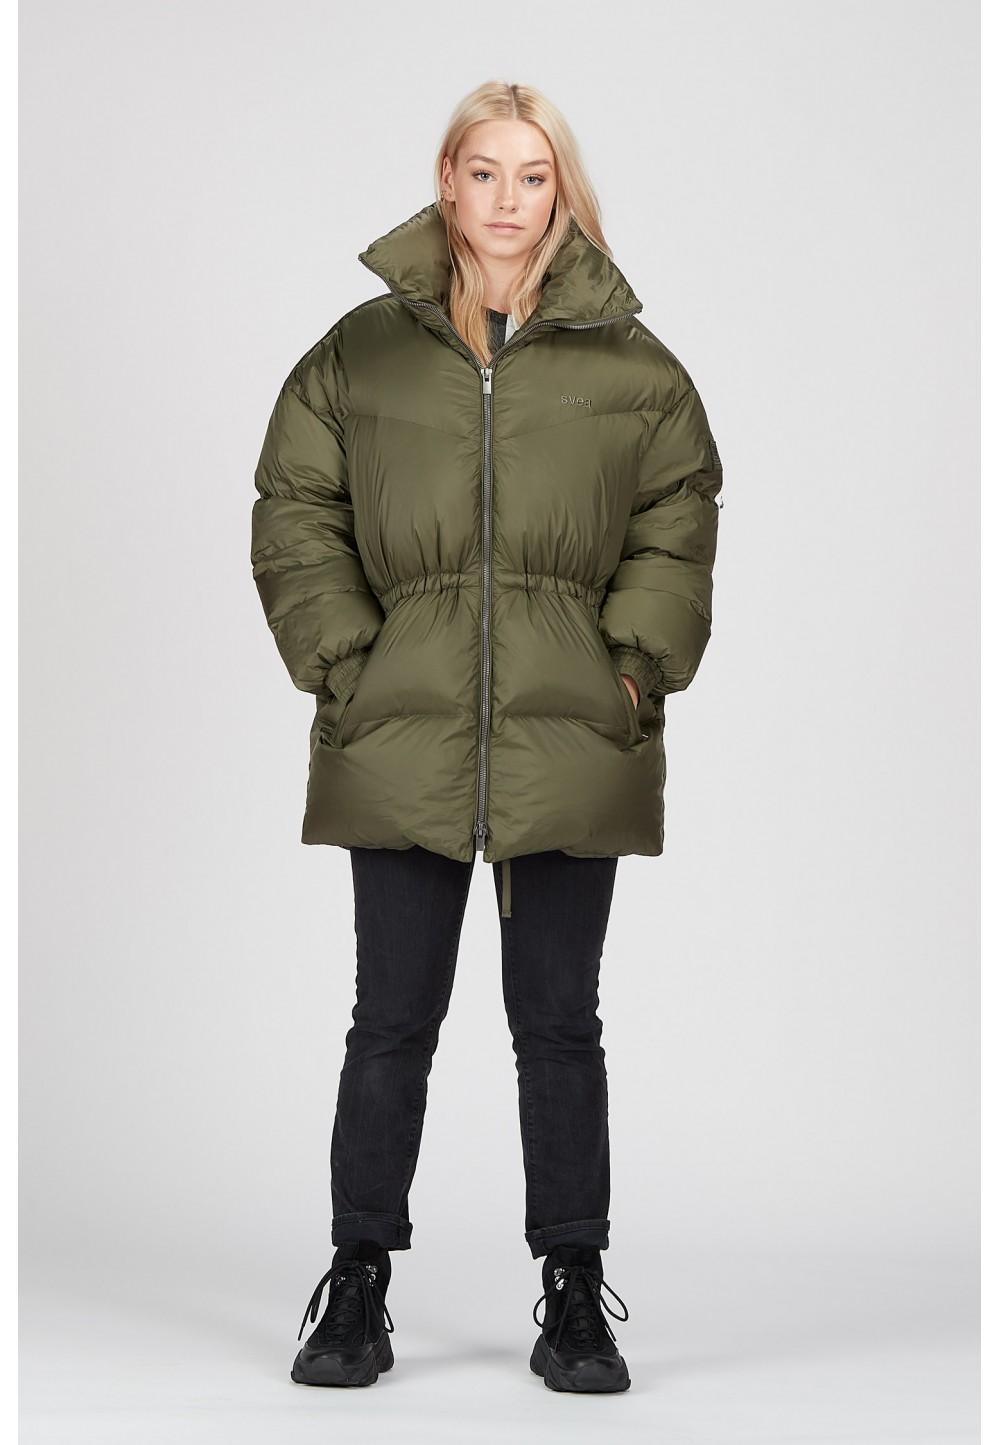 Теплая куртка свободного кроя цвета хаки